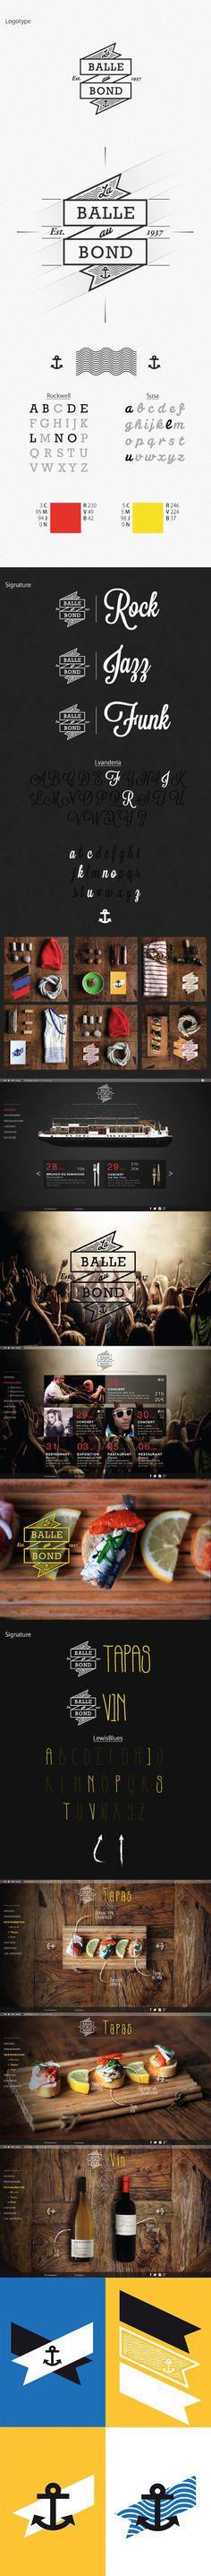 corporate design, thoma rogervey, graphic design, ball au, identity branding